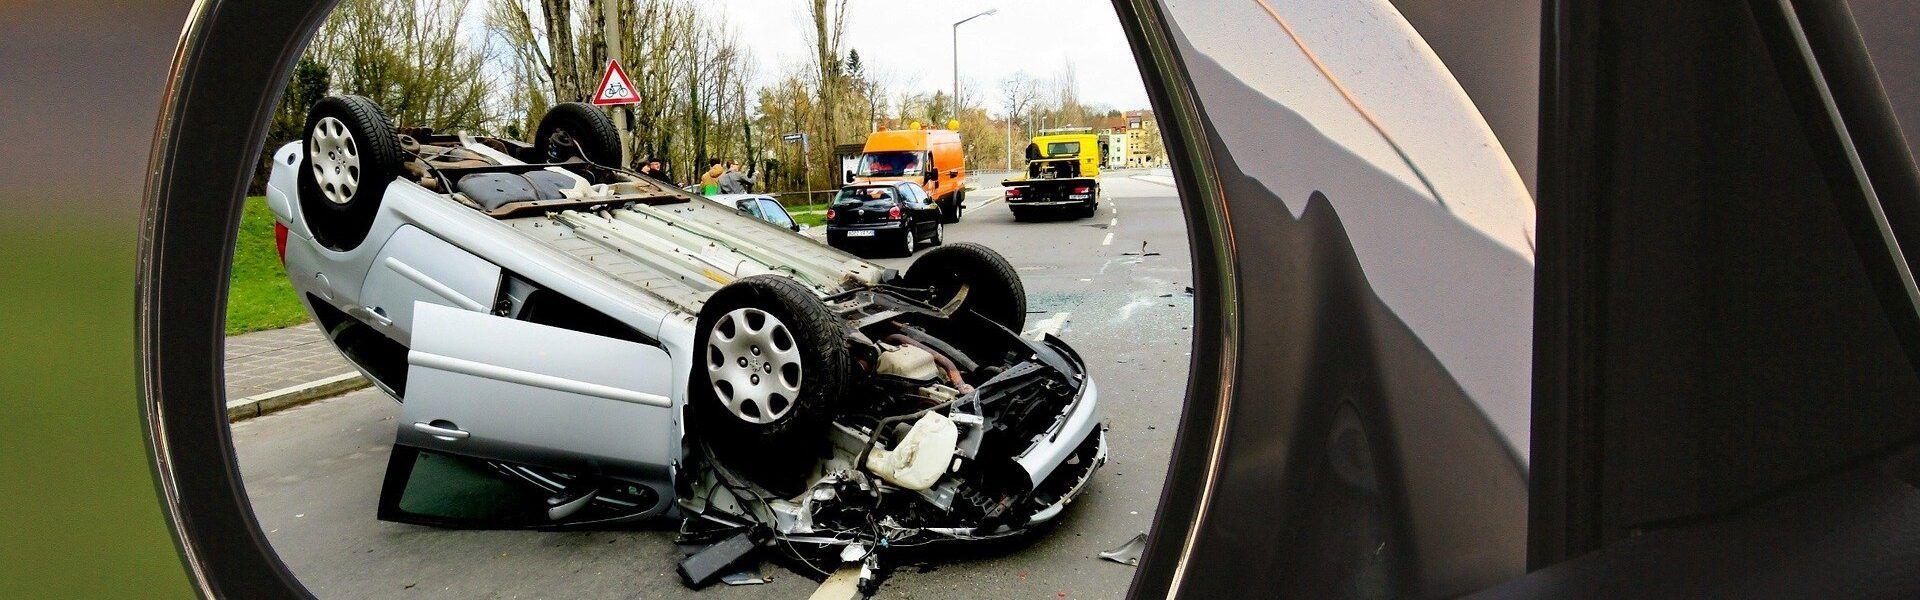 accidente 1 e1620130521621 | Total Renting